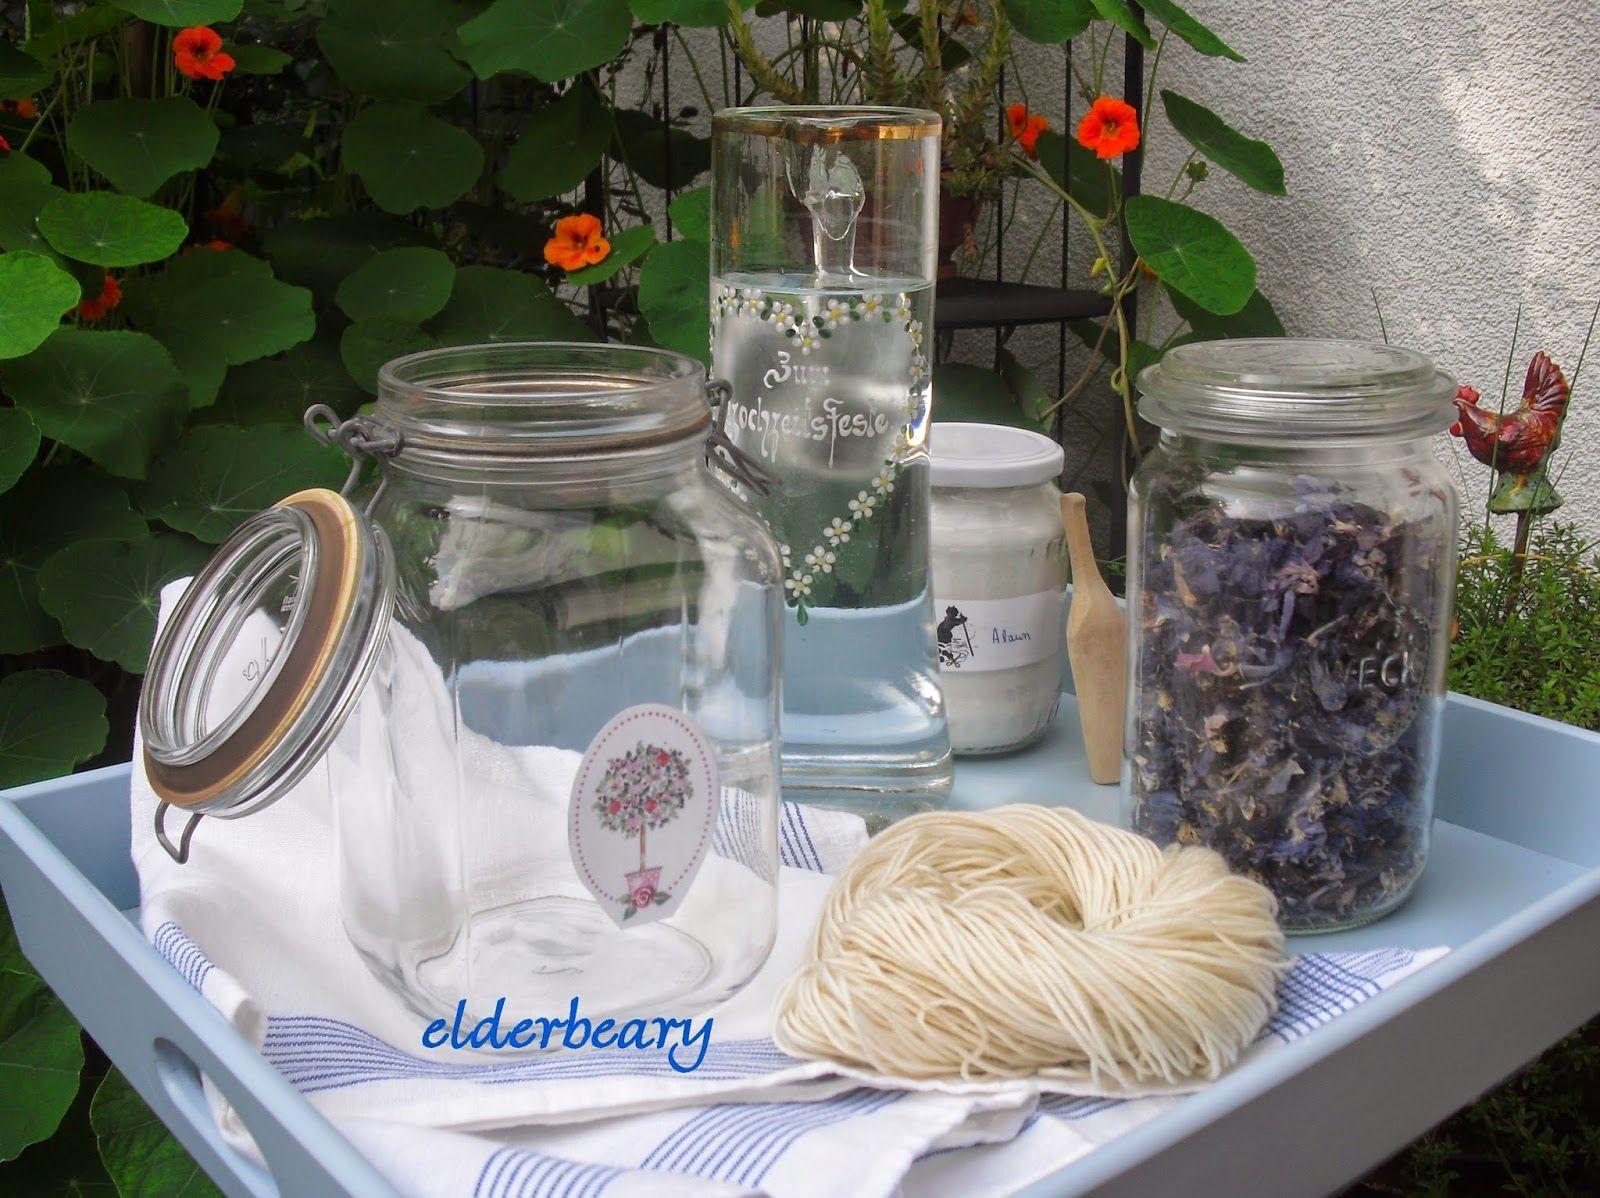 Solar dyeing with columbine flowers (Aquilegia vulgaris)